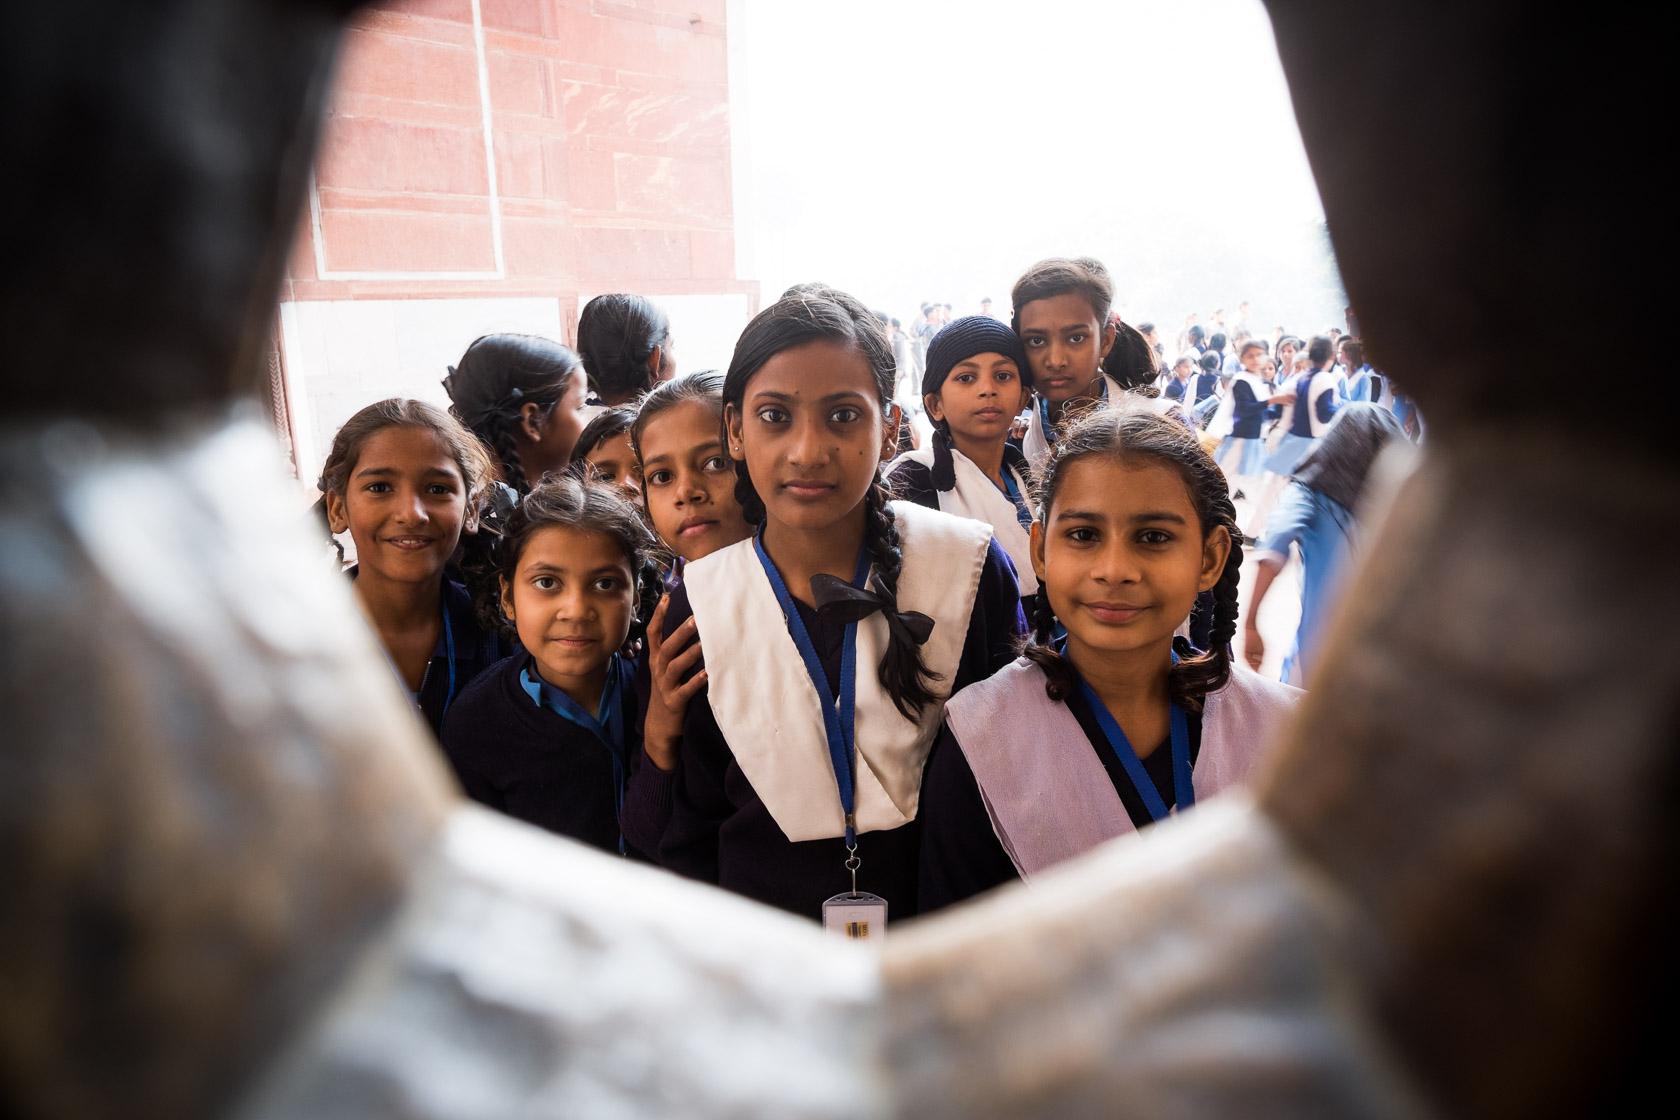 School Group through Jali Window, Delhi, India